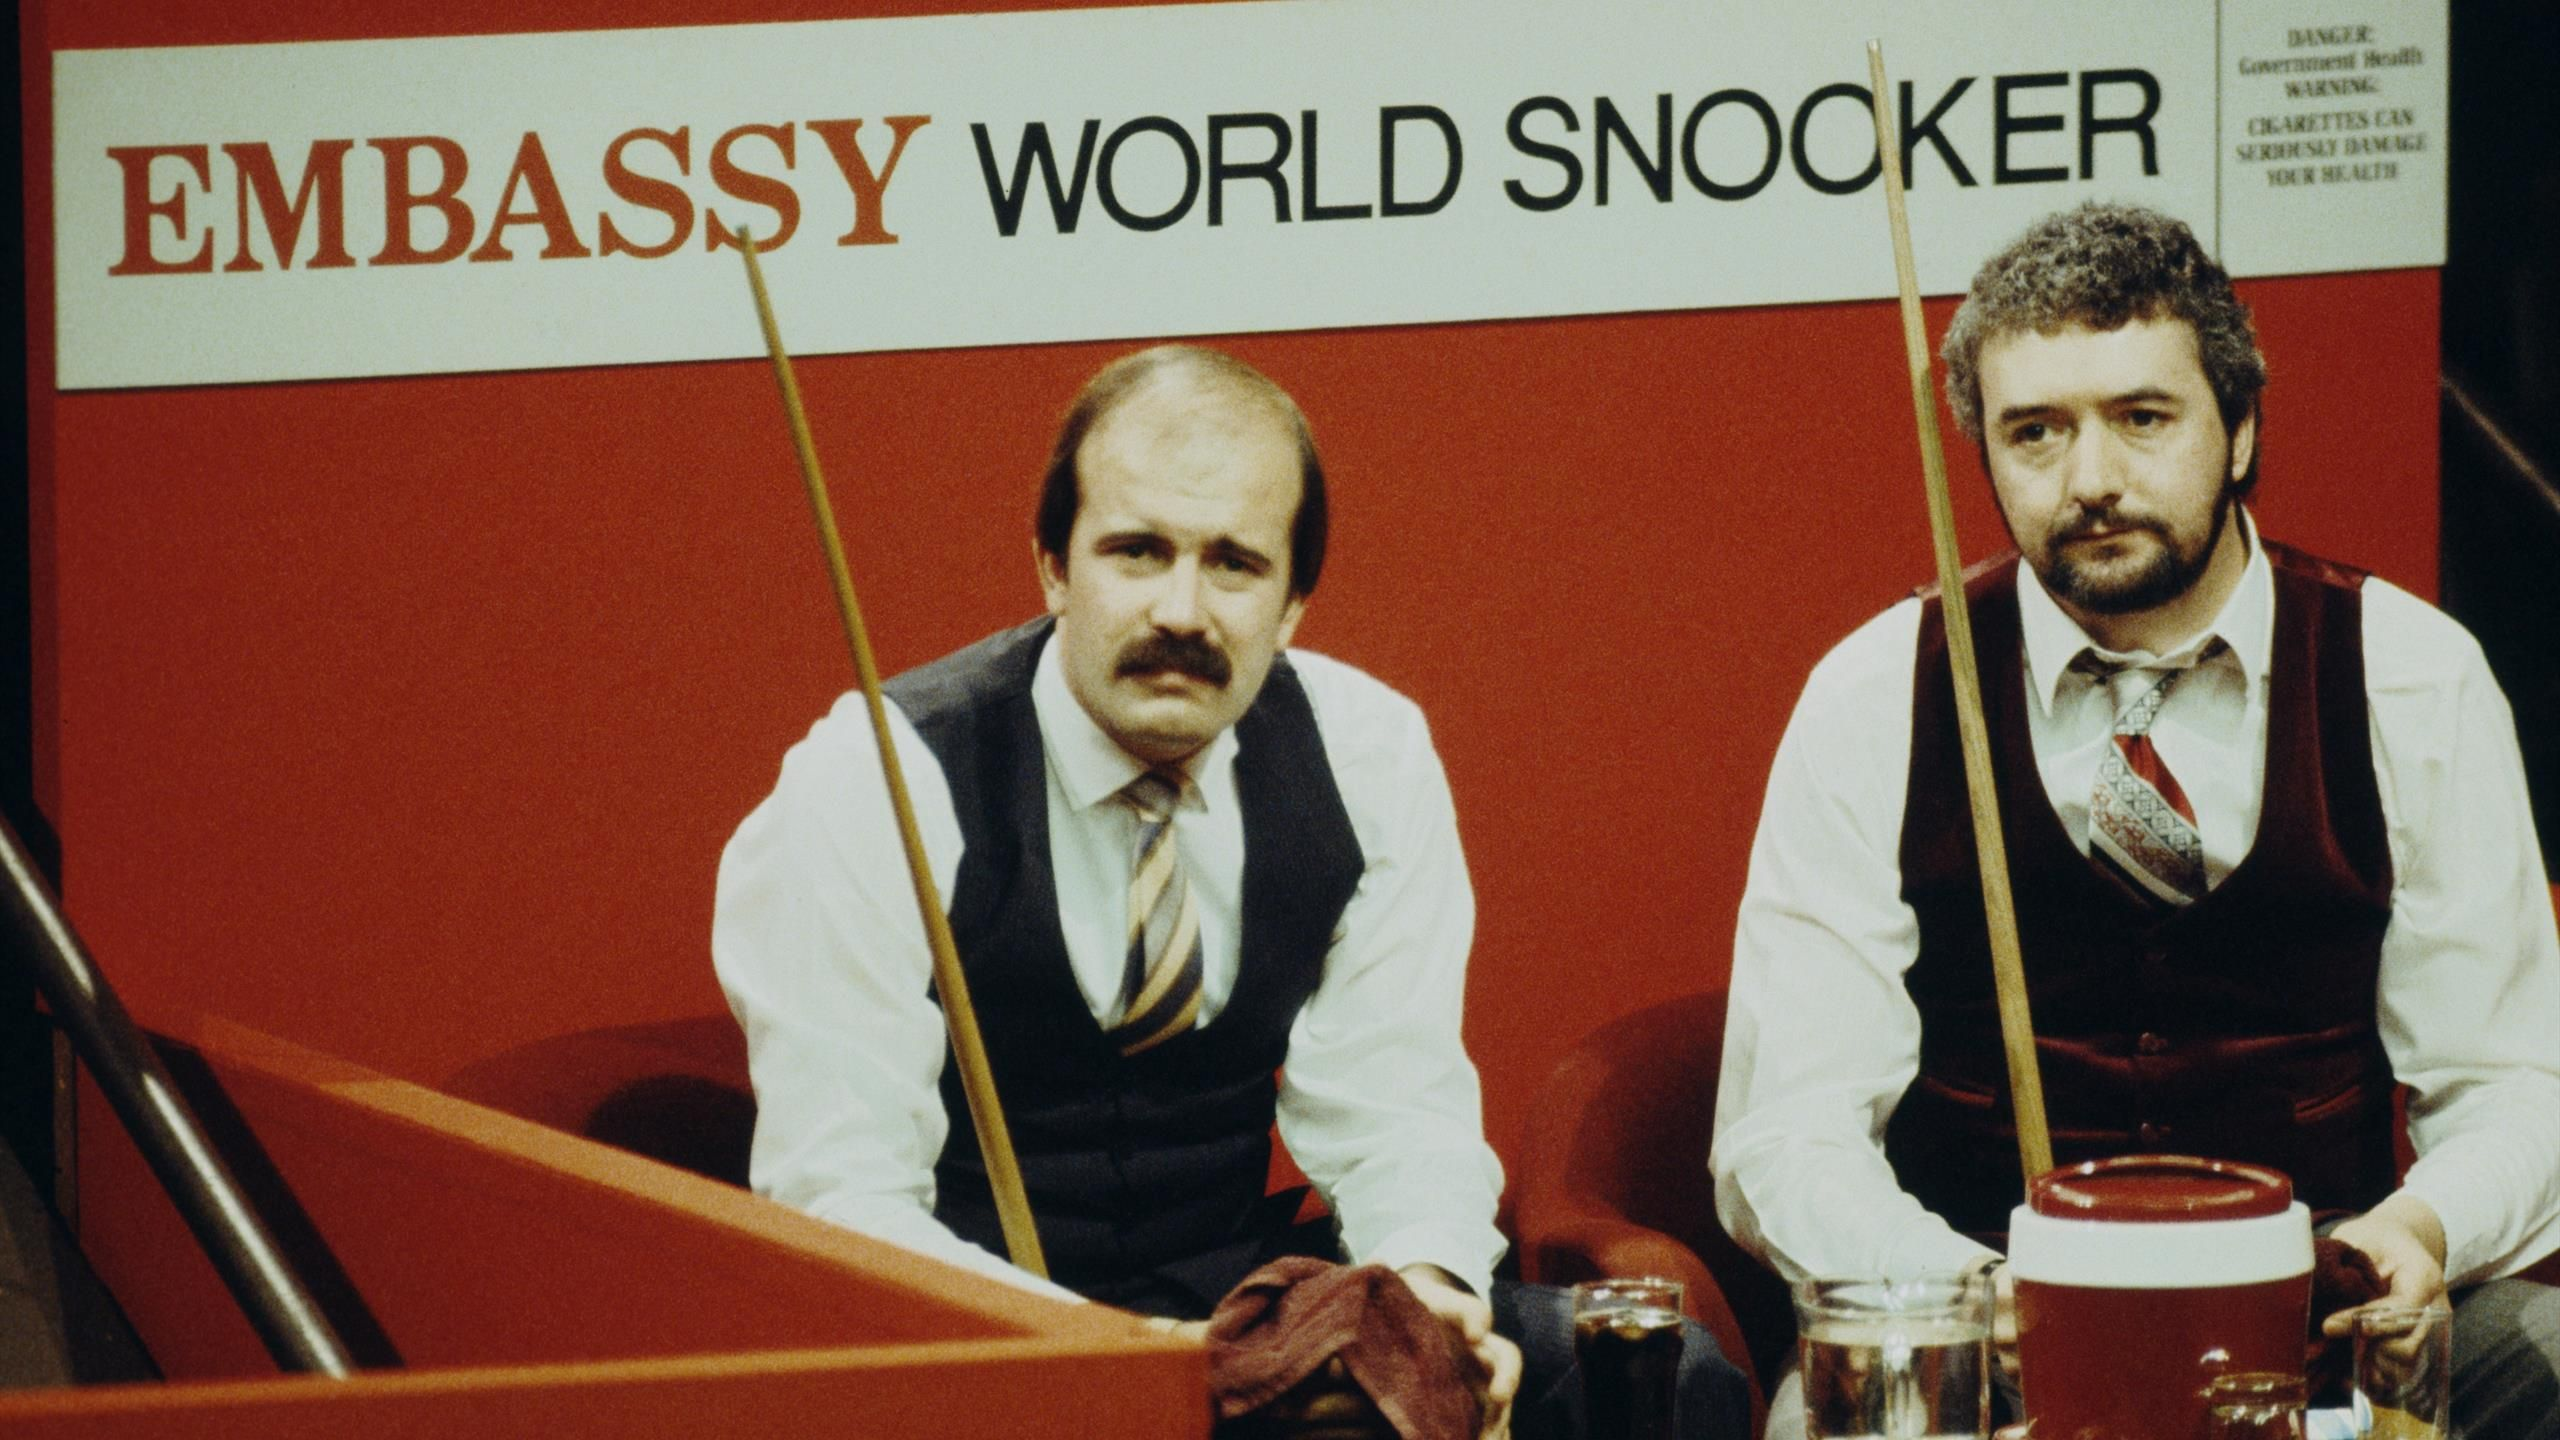 Willie Thorne: Kematian tragis idola Snooker harus meninggalkan warisan - Snooker